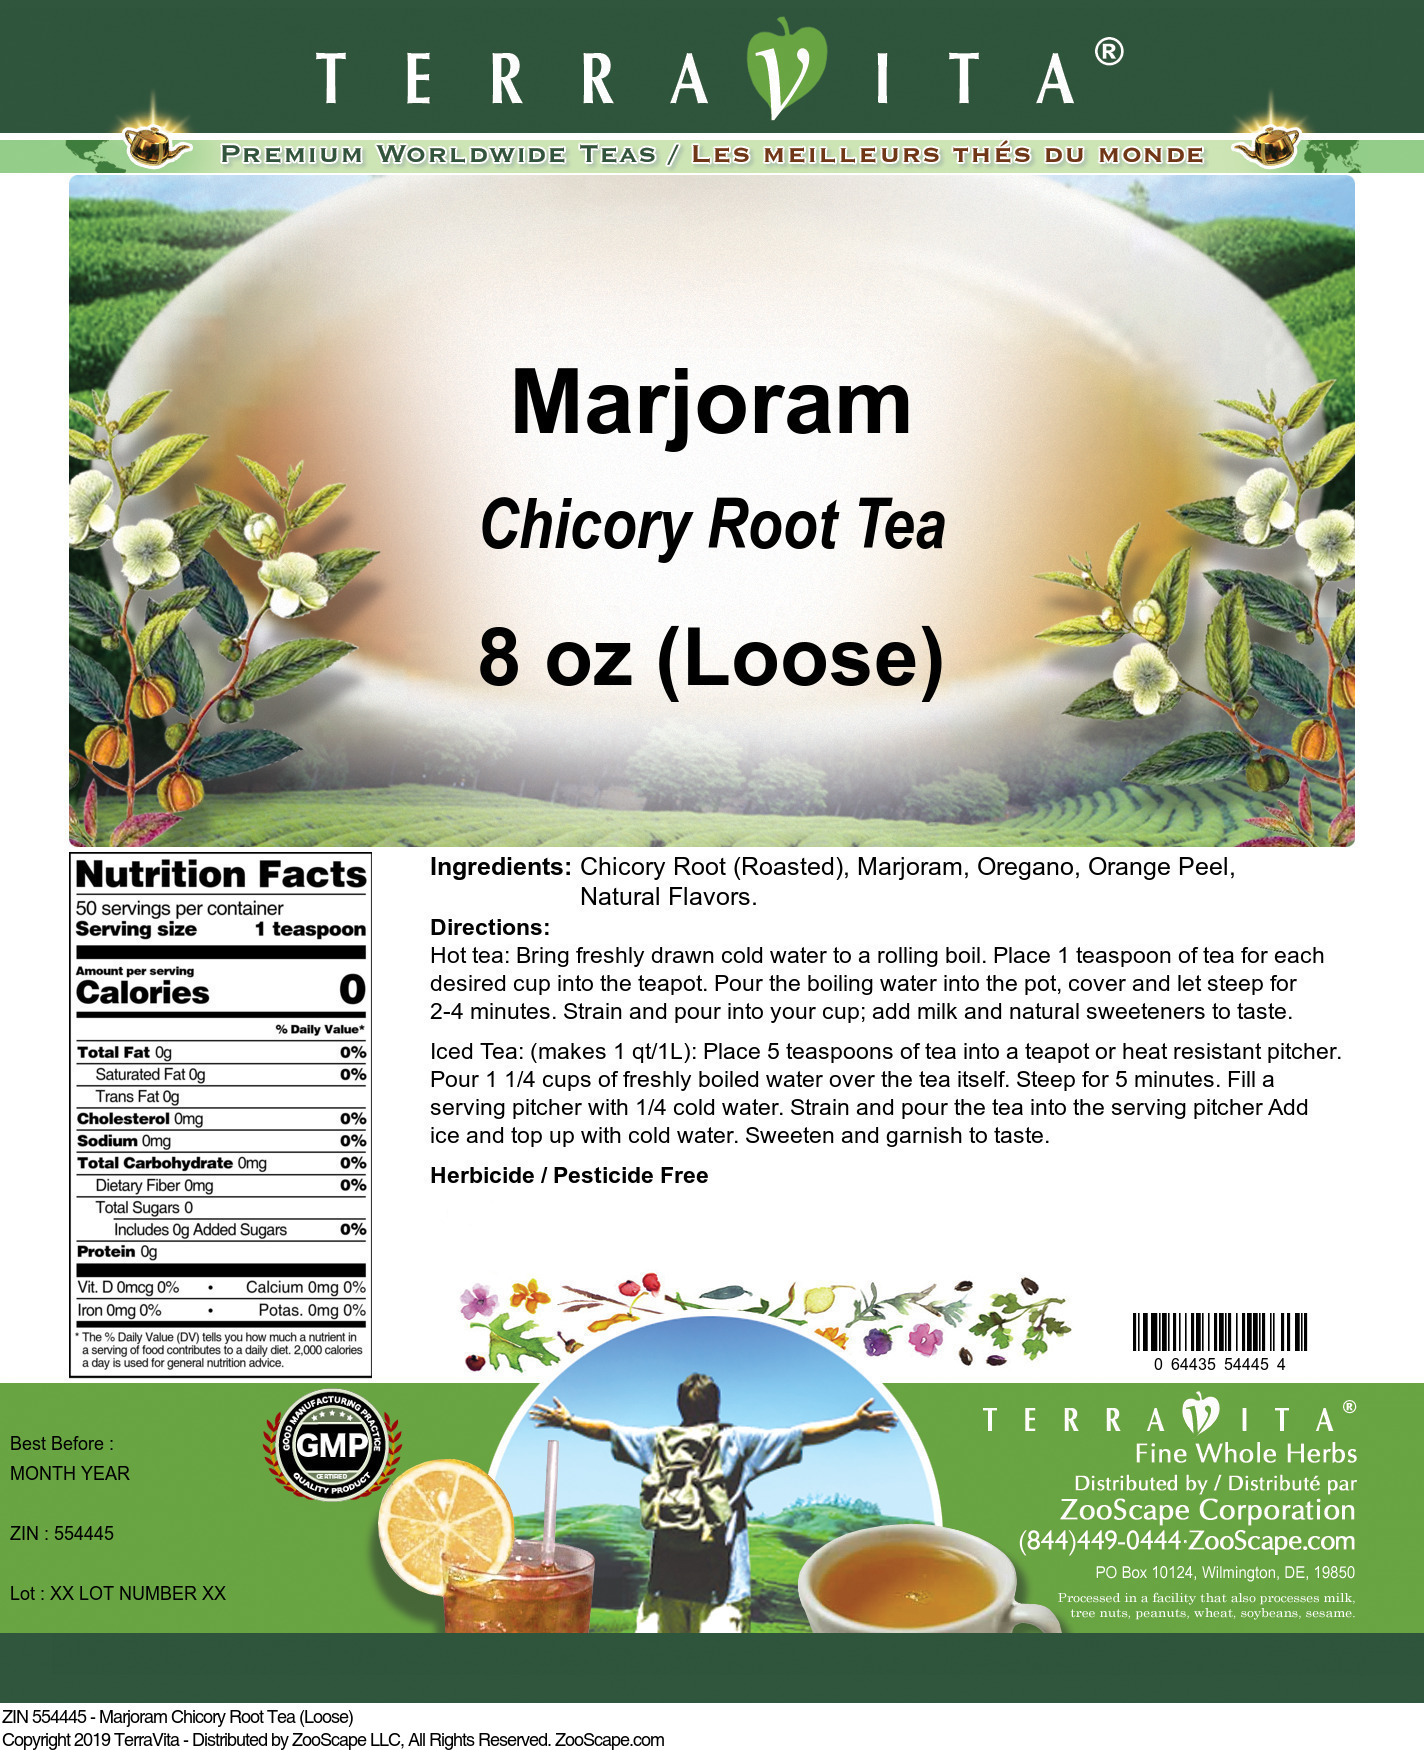 Marjoram Chicory Root Tea (Loose)